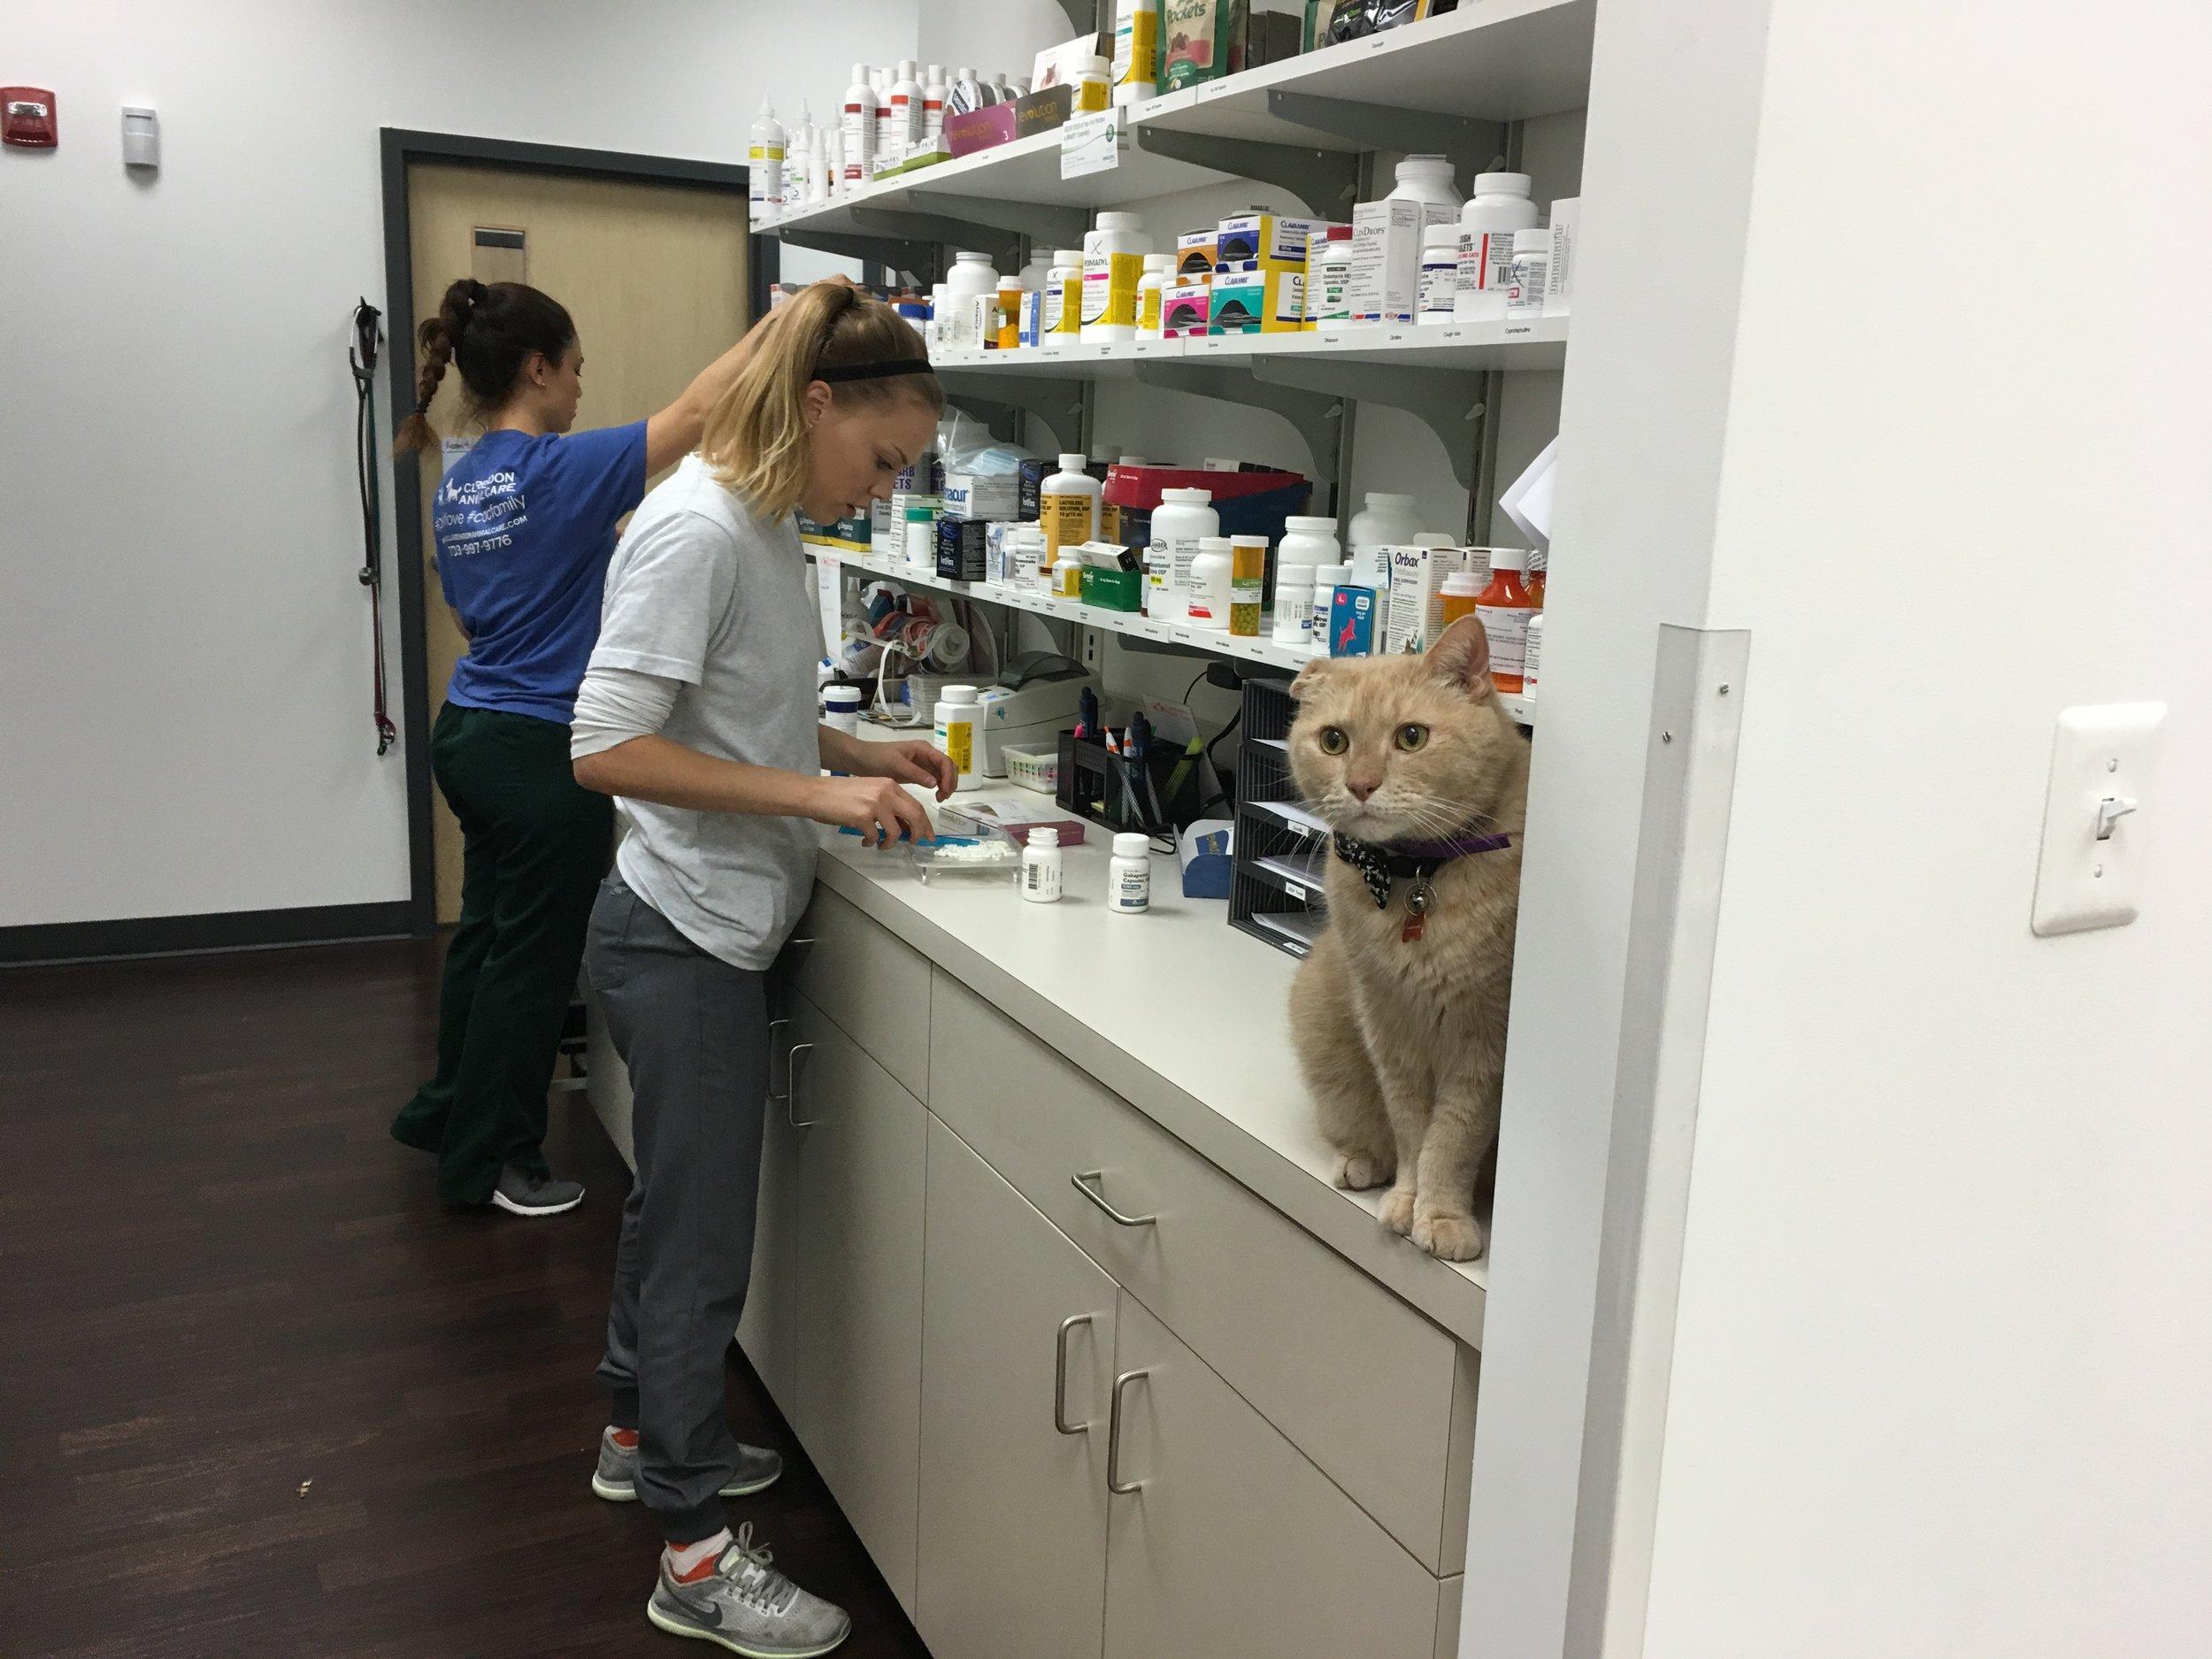 Clarendon Animal Care Veterinary Clinic Arlington Virginia Assistant in the pharmacy